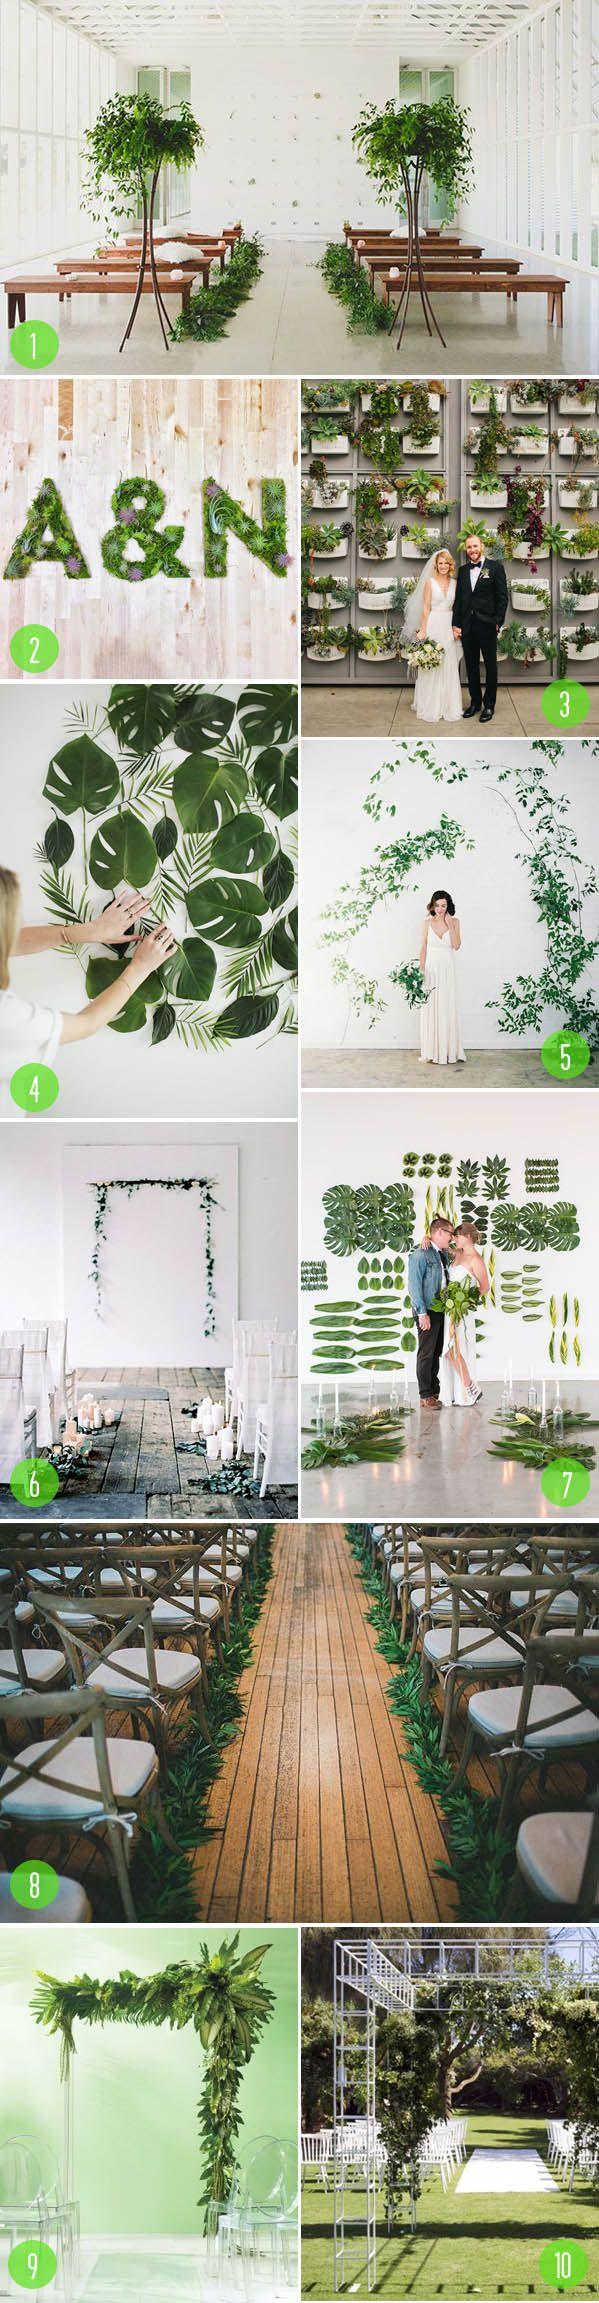 Share Tweet Pin Mail 1. via Green Wedding Shoes   2. via Well Groomed   3. via Green Wedding Shoes   4. Almost Makes ...